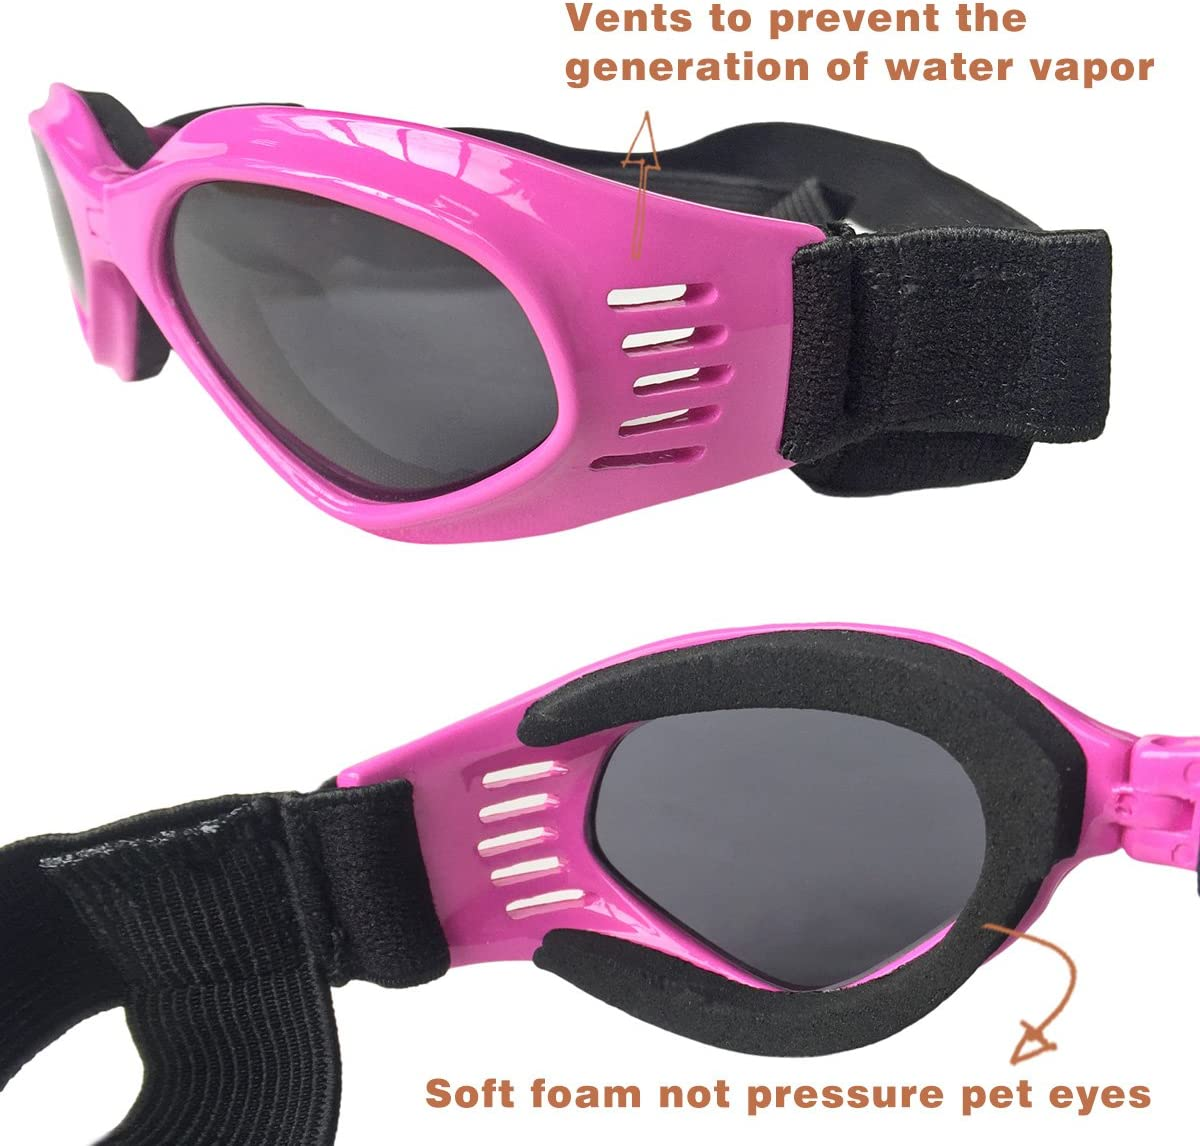 Stylish Dog Sunglasses for UV Stop Waterproof Windproof Anti-Fog Eye Protection Petleso Pet Goggles